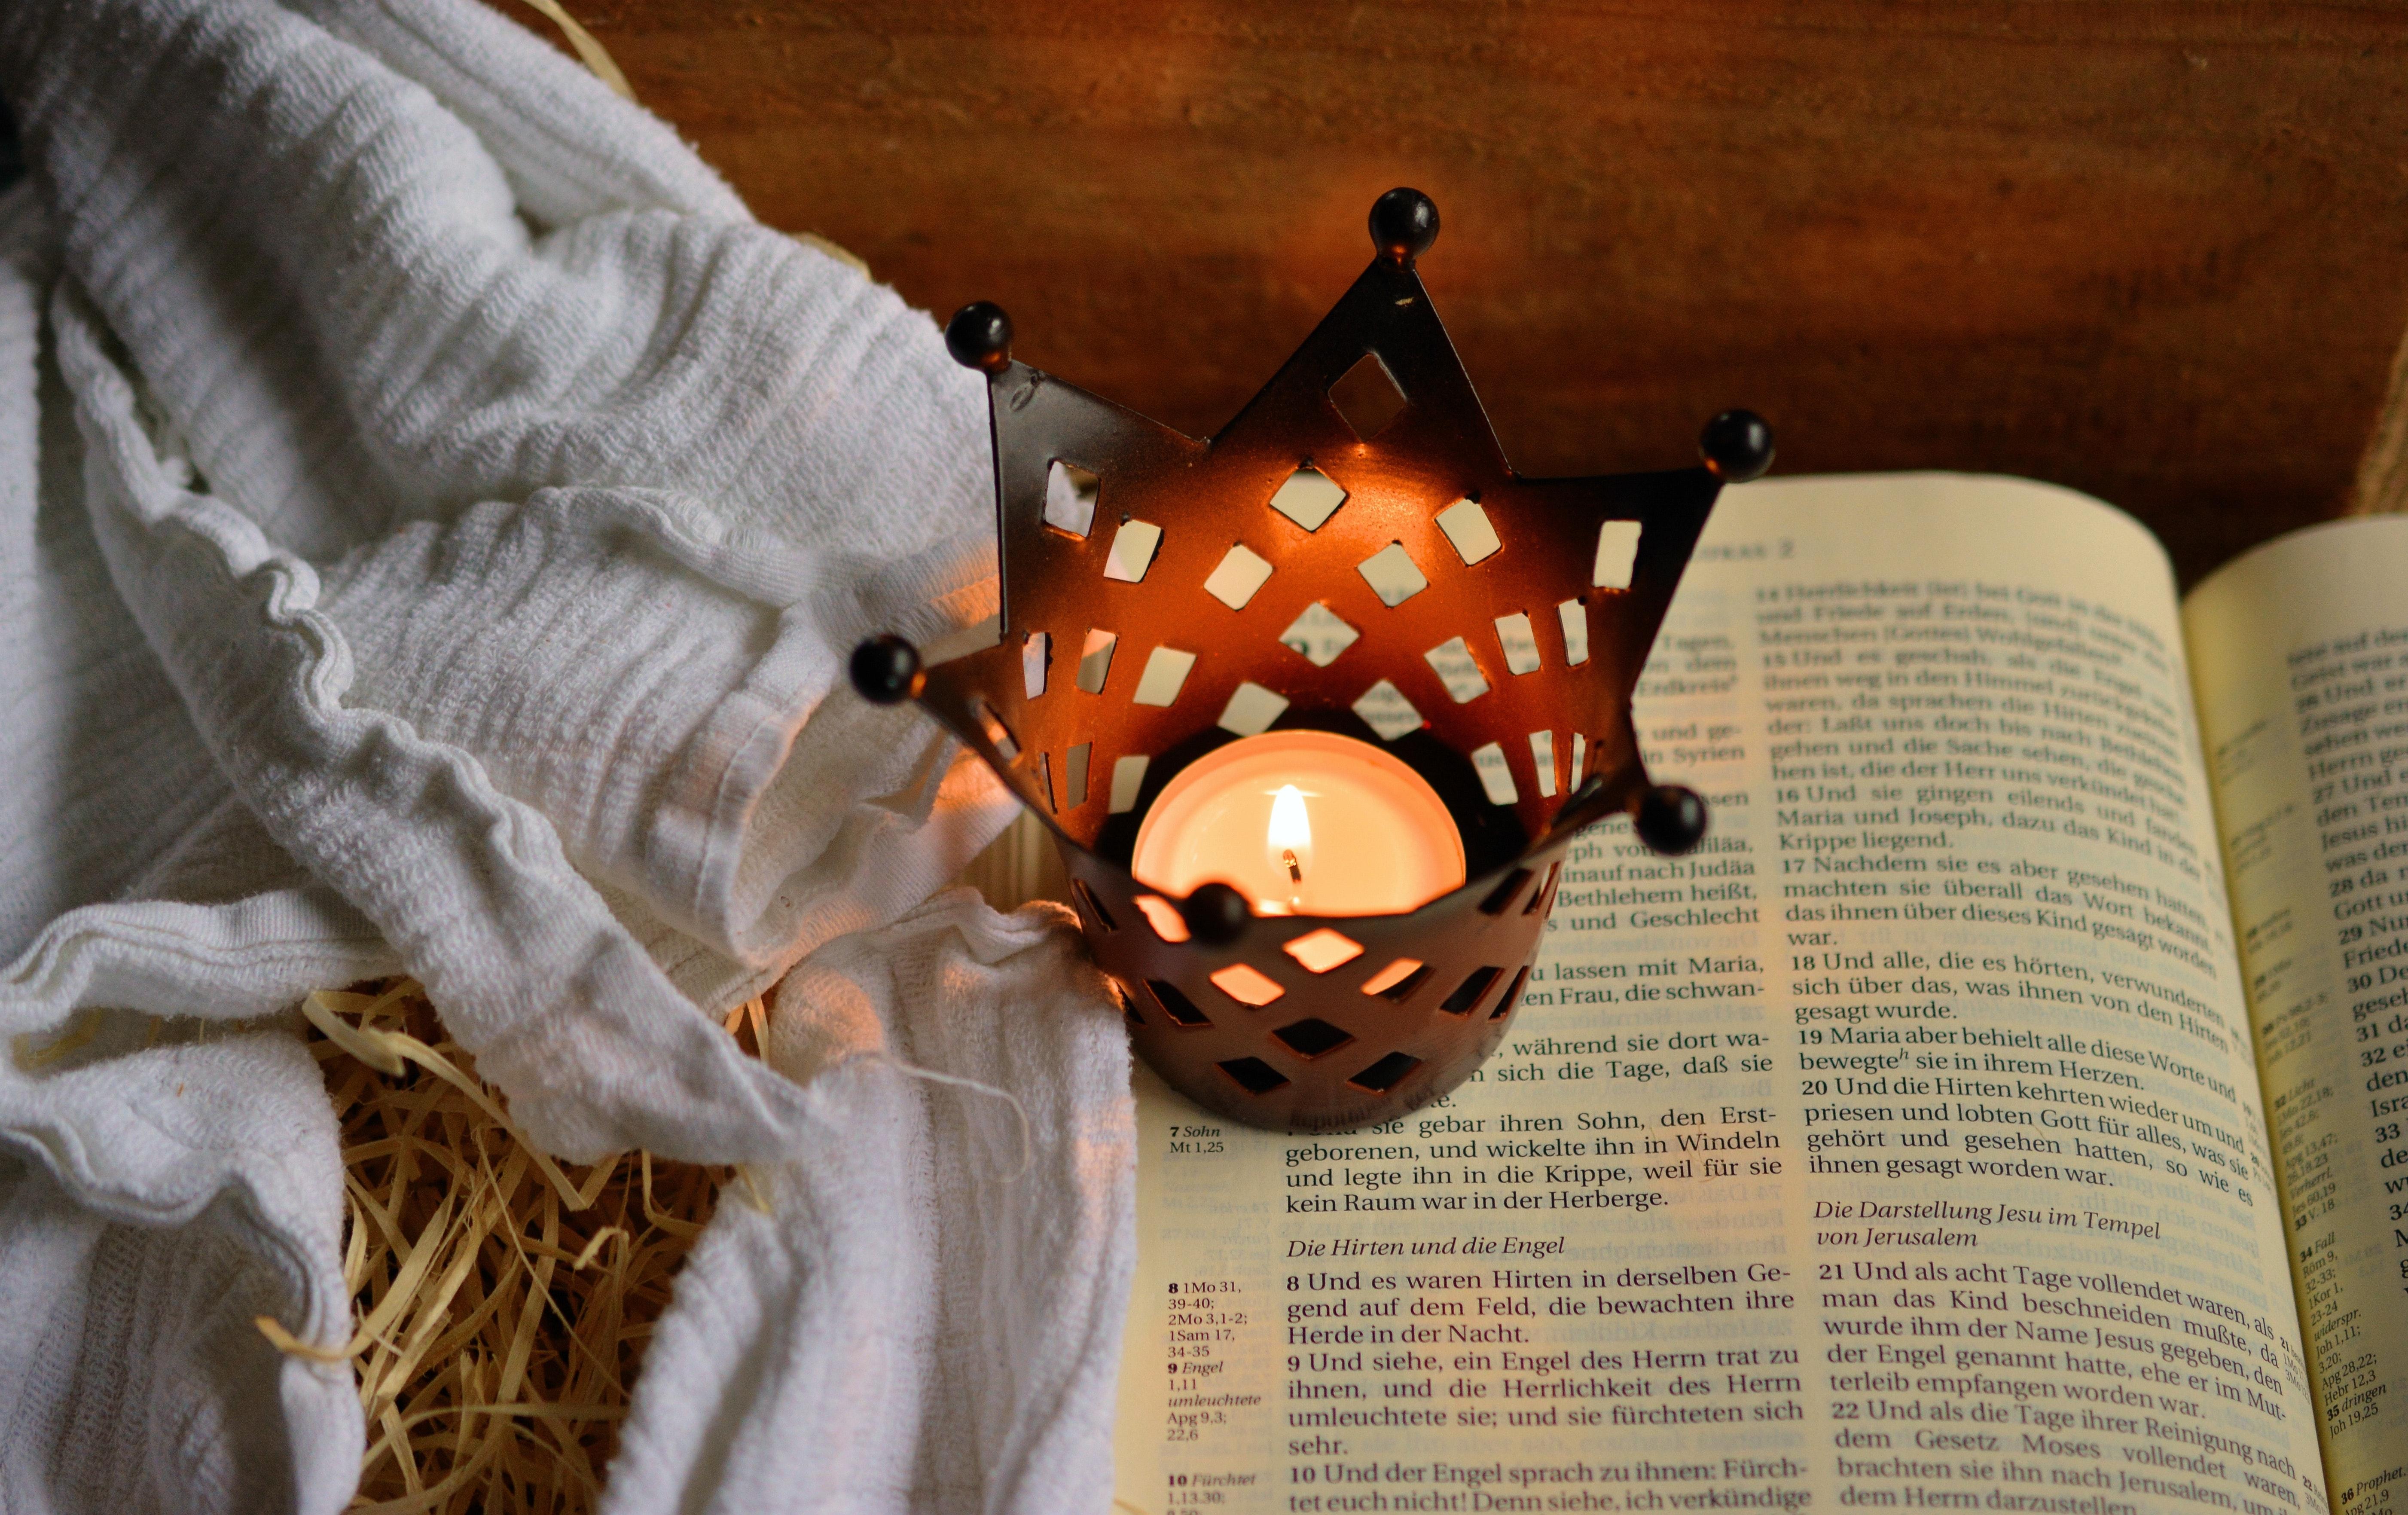 bible-candle-christianity-236326